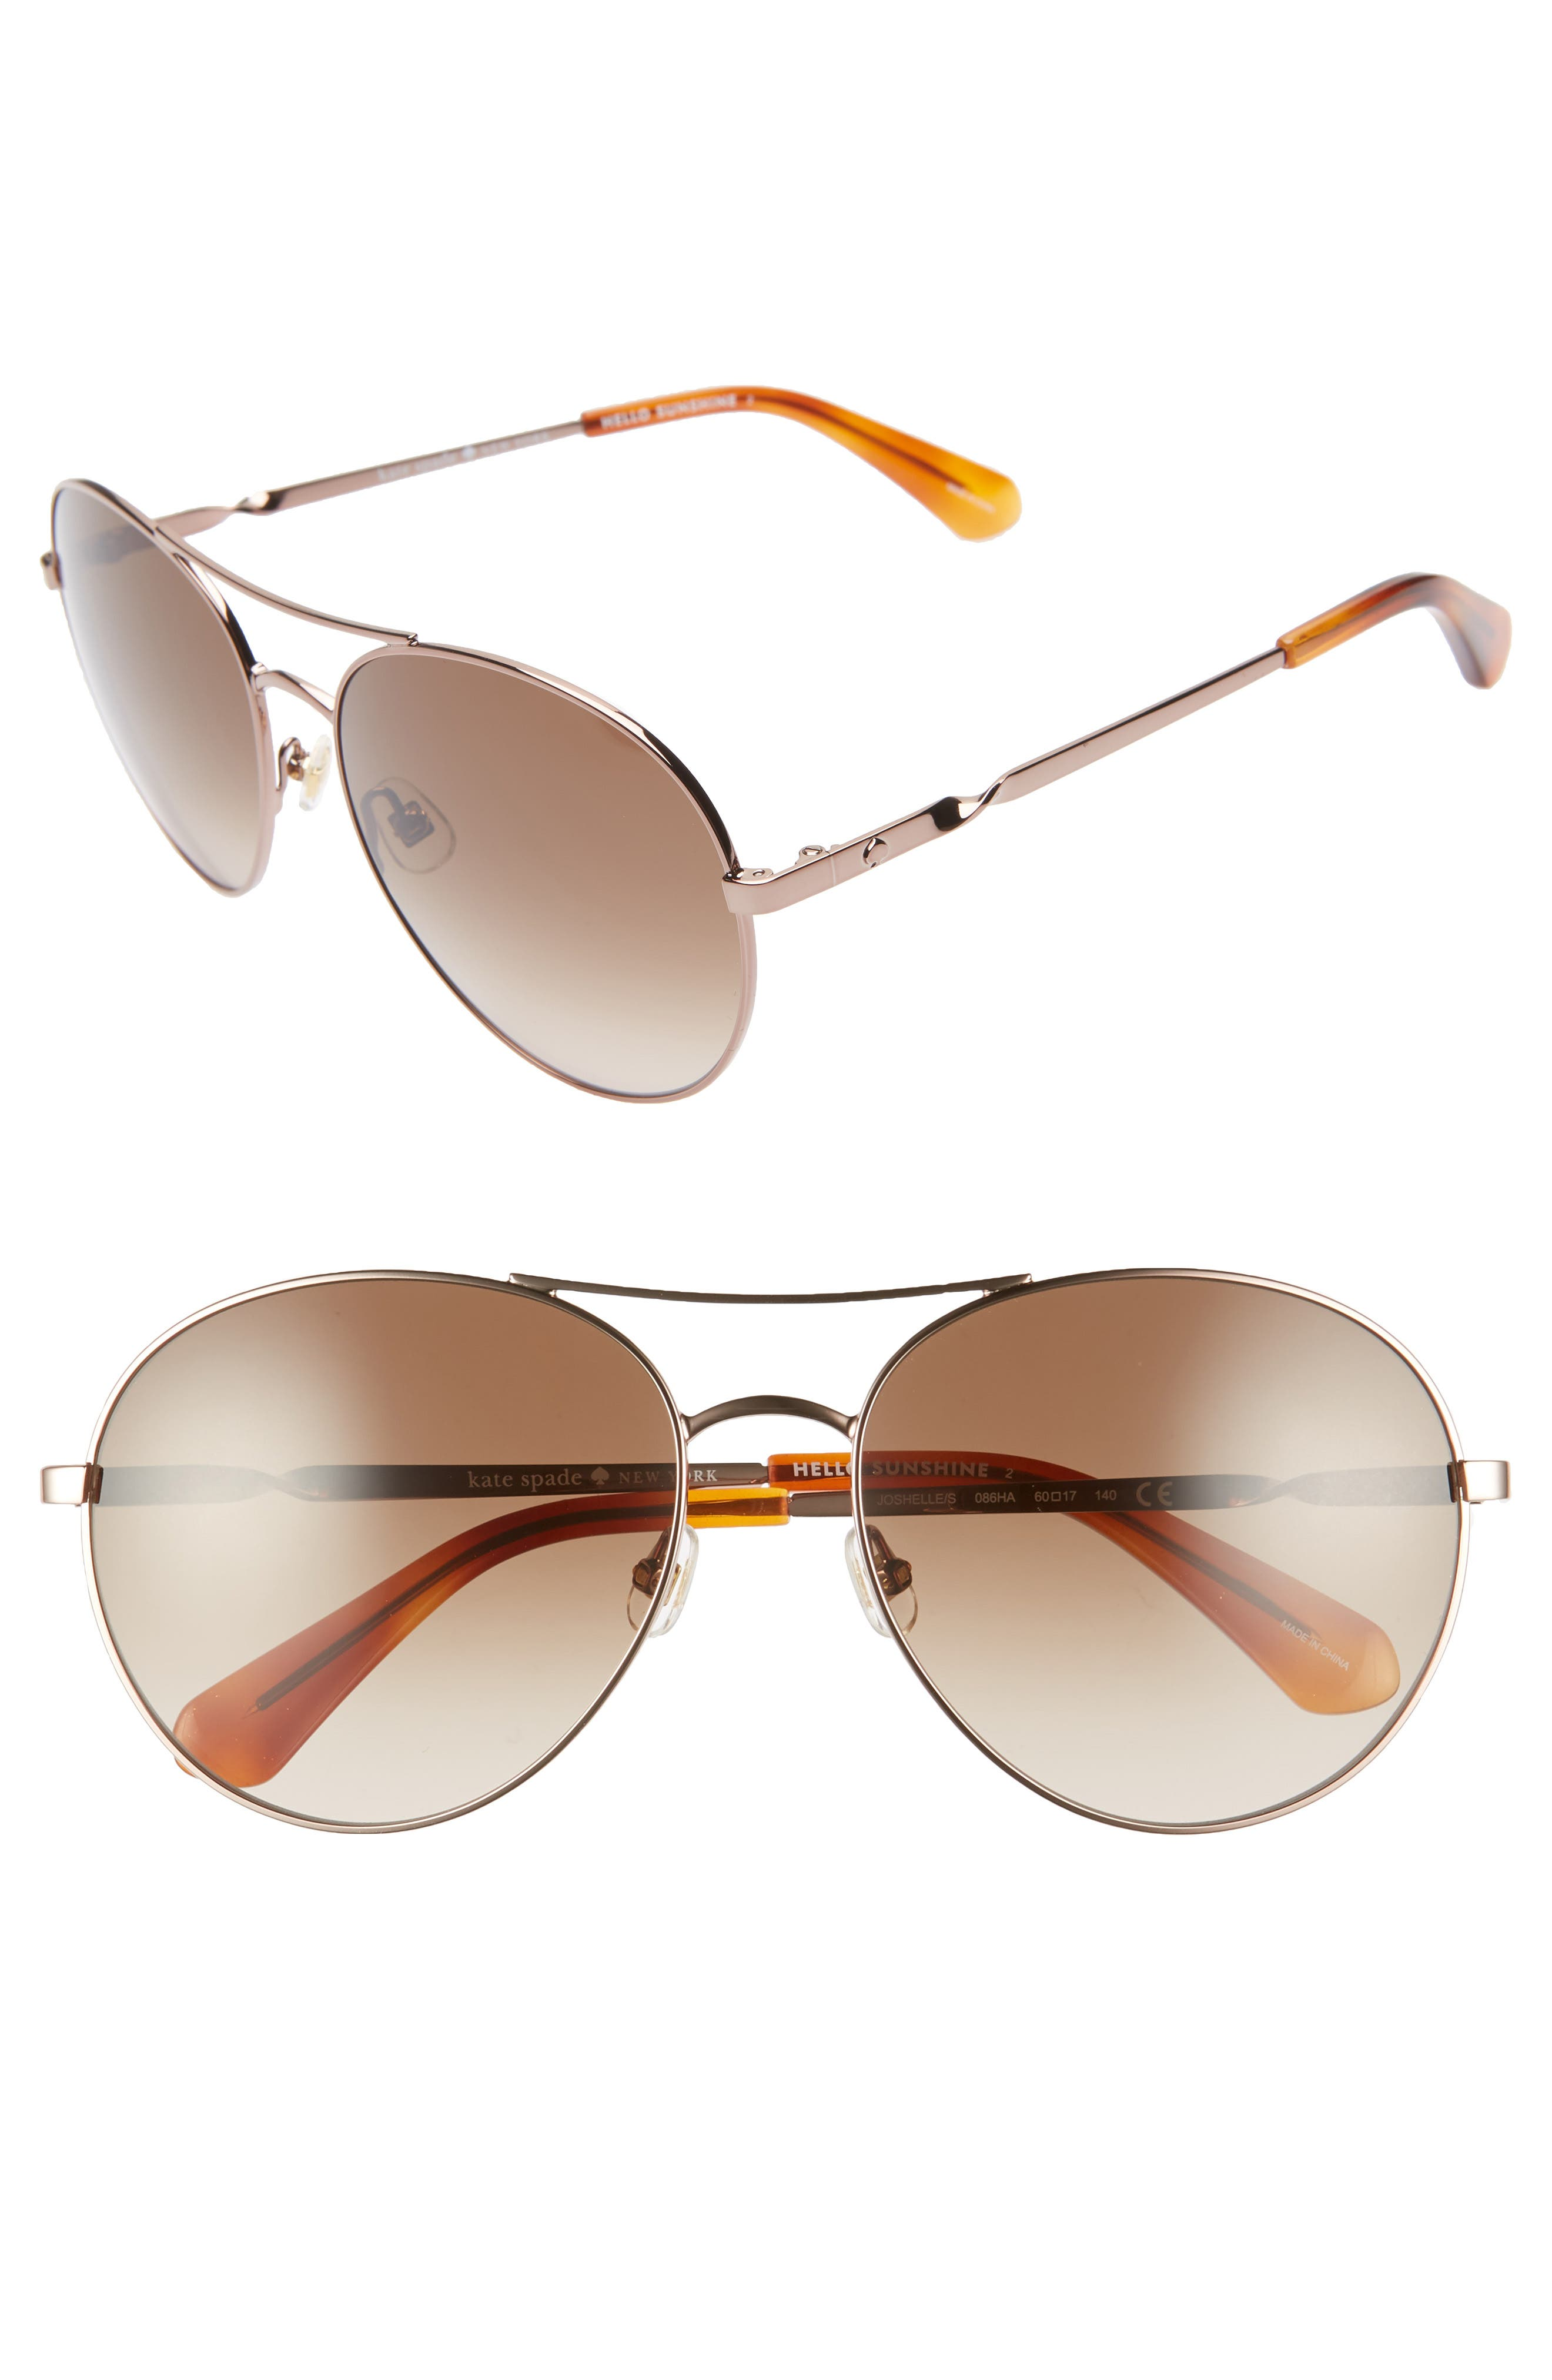 Image of kate spade new york joshelle 60mm polarized aviator sunglasses